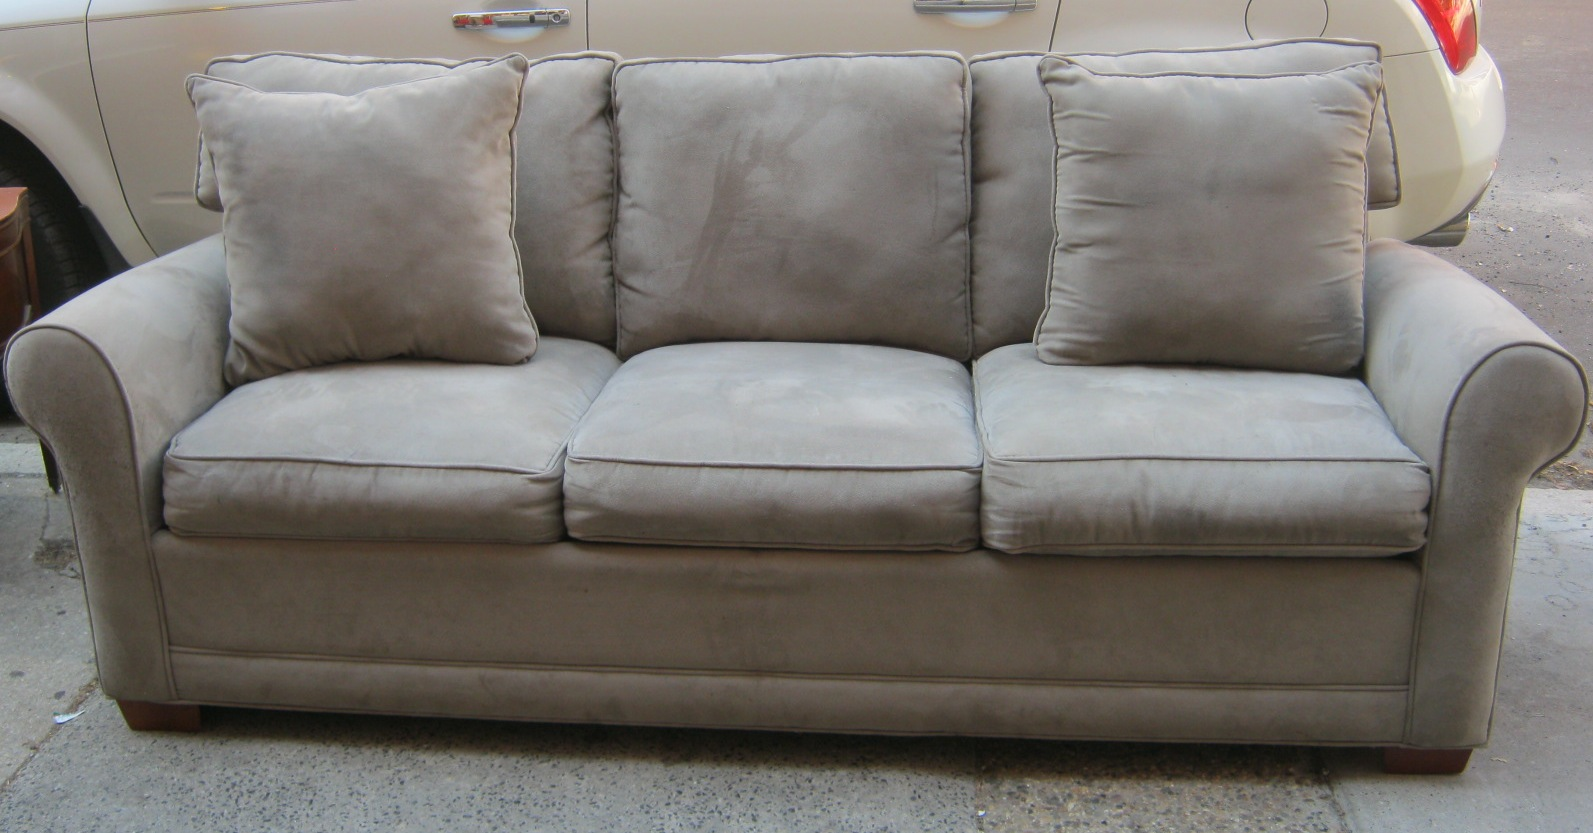 Microfiber Sofas Room Store Uhuru Furniture Collectibles Grey Sofa Bed Sold